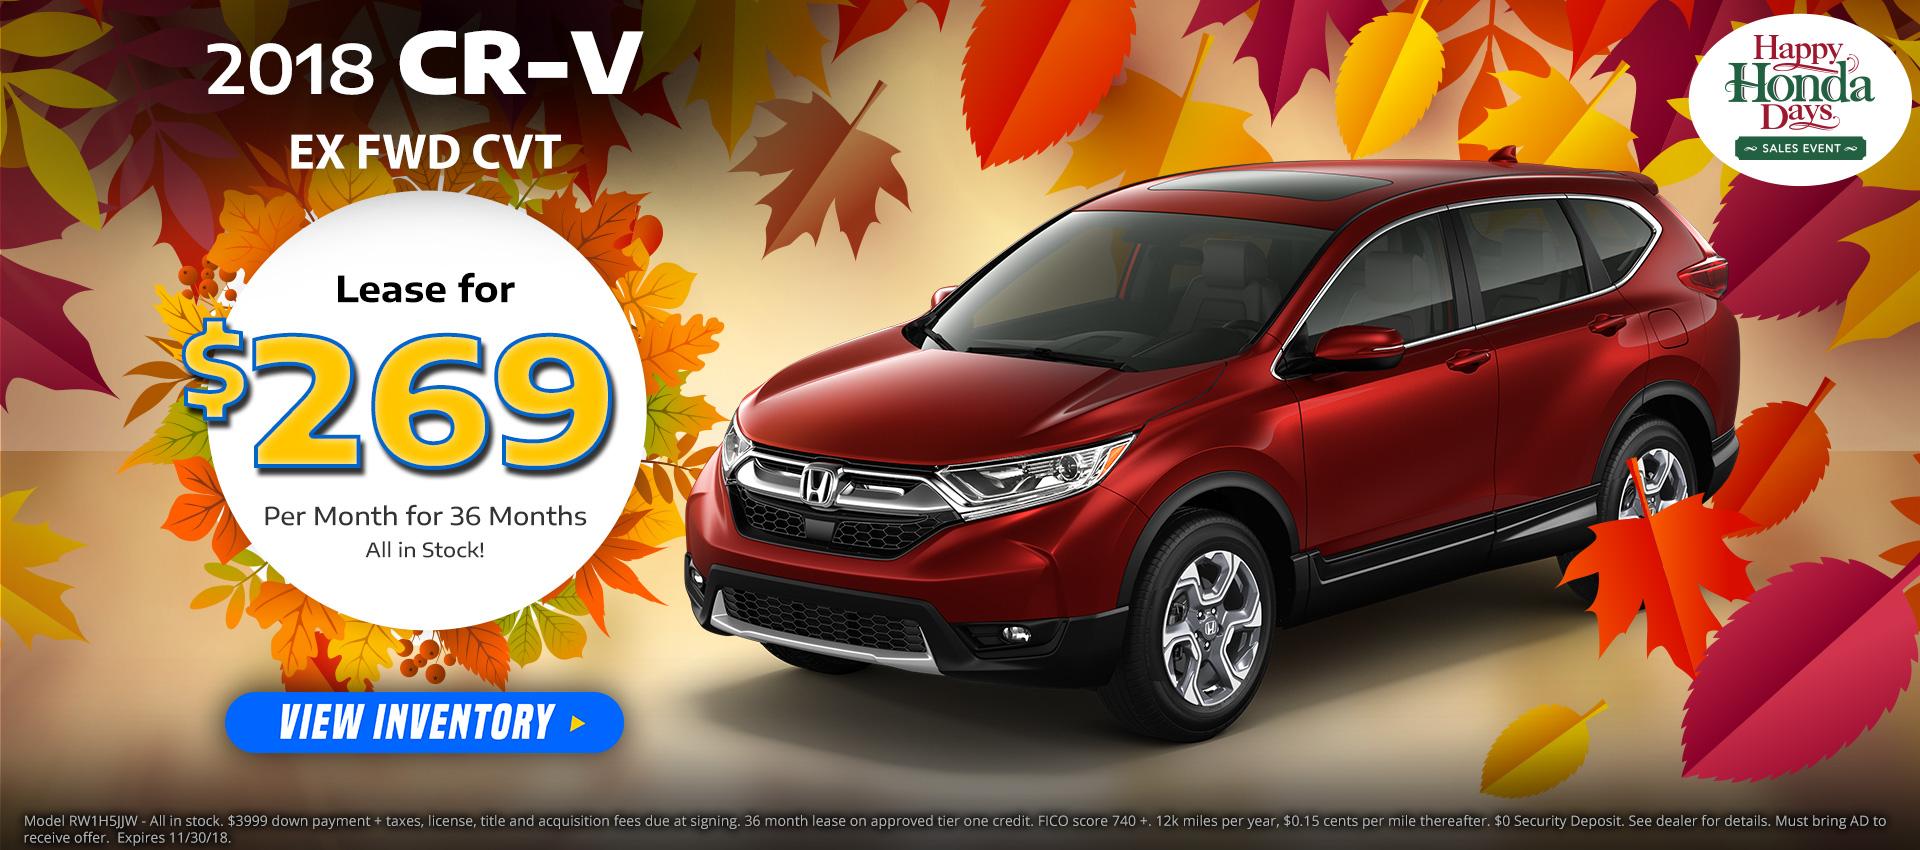 Honda CRV $269 Lease